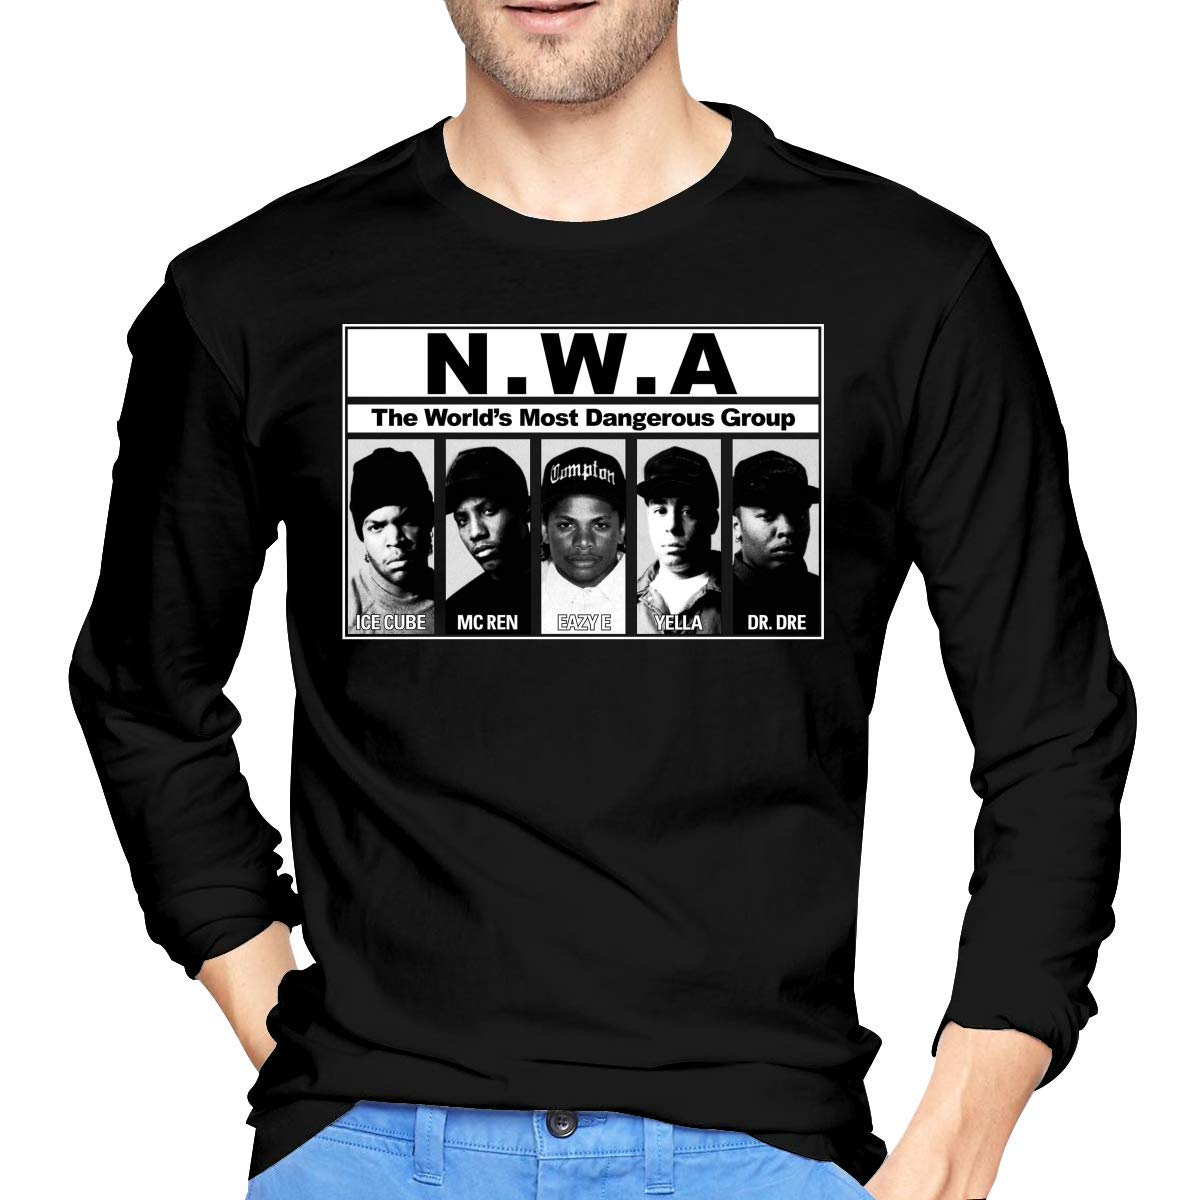 Fssatung S Nwapng Tshirts Black